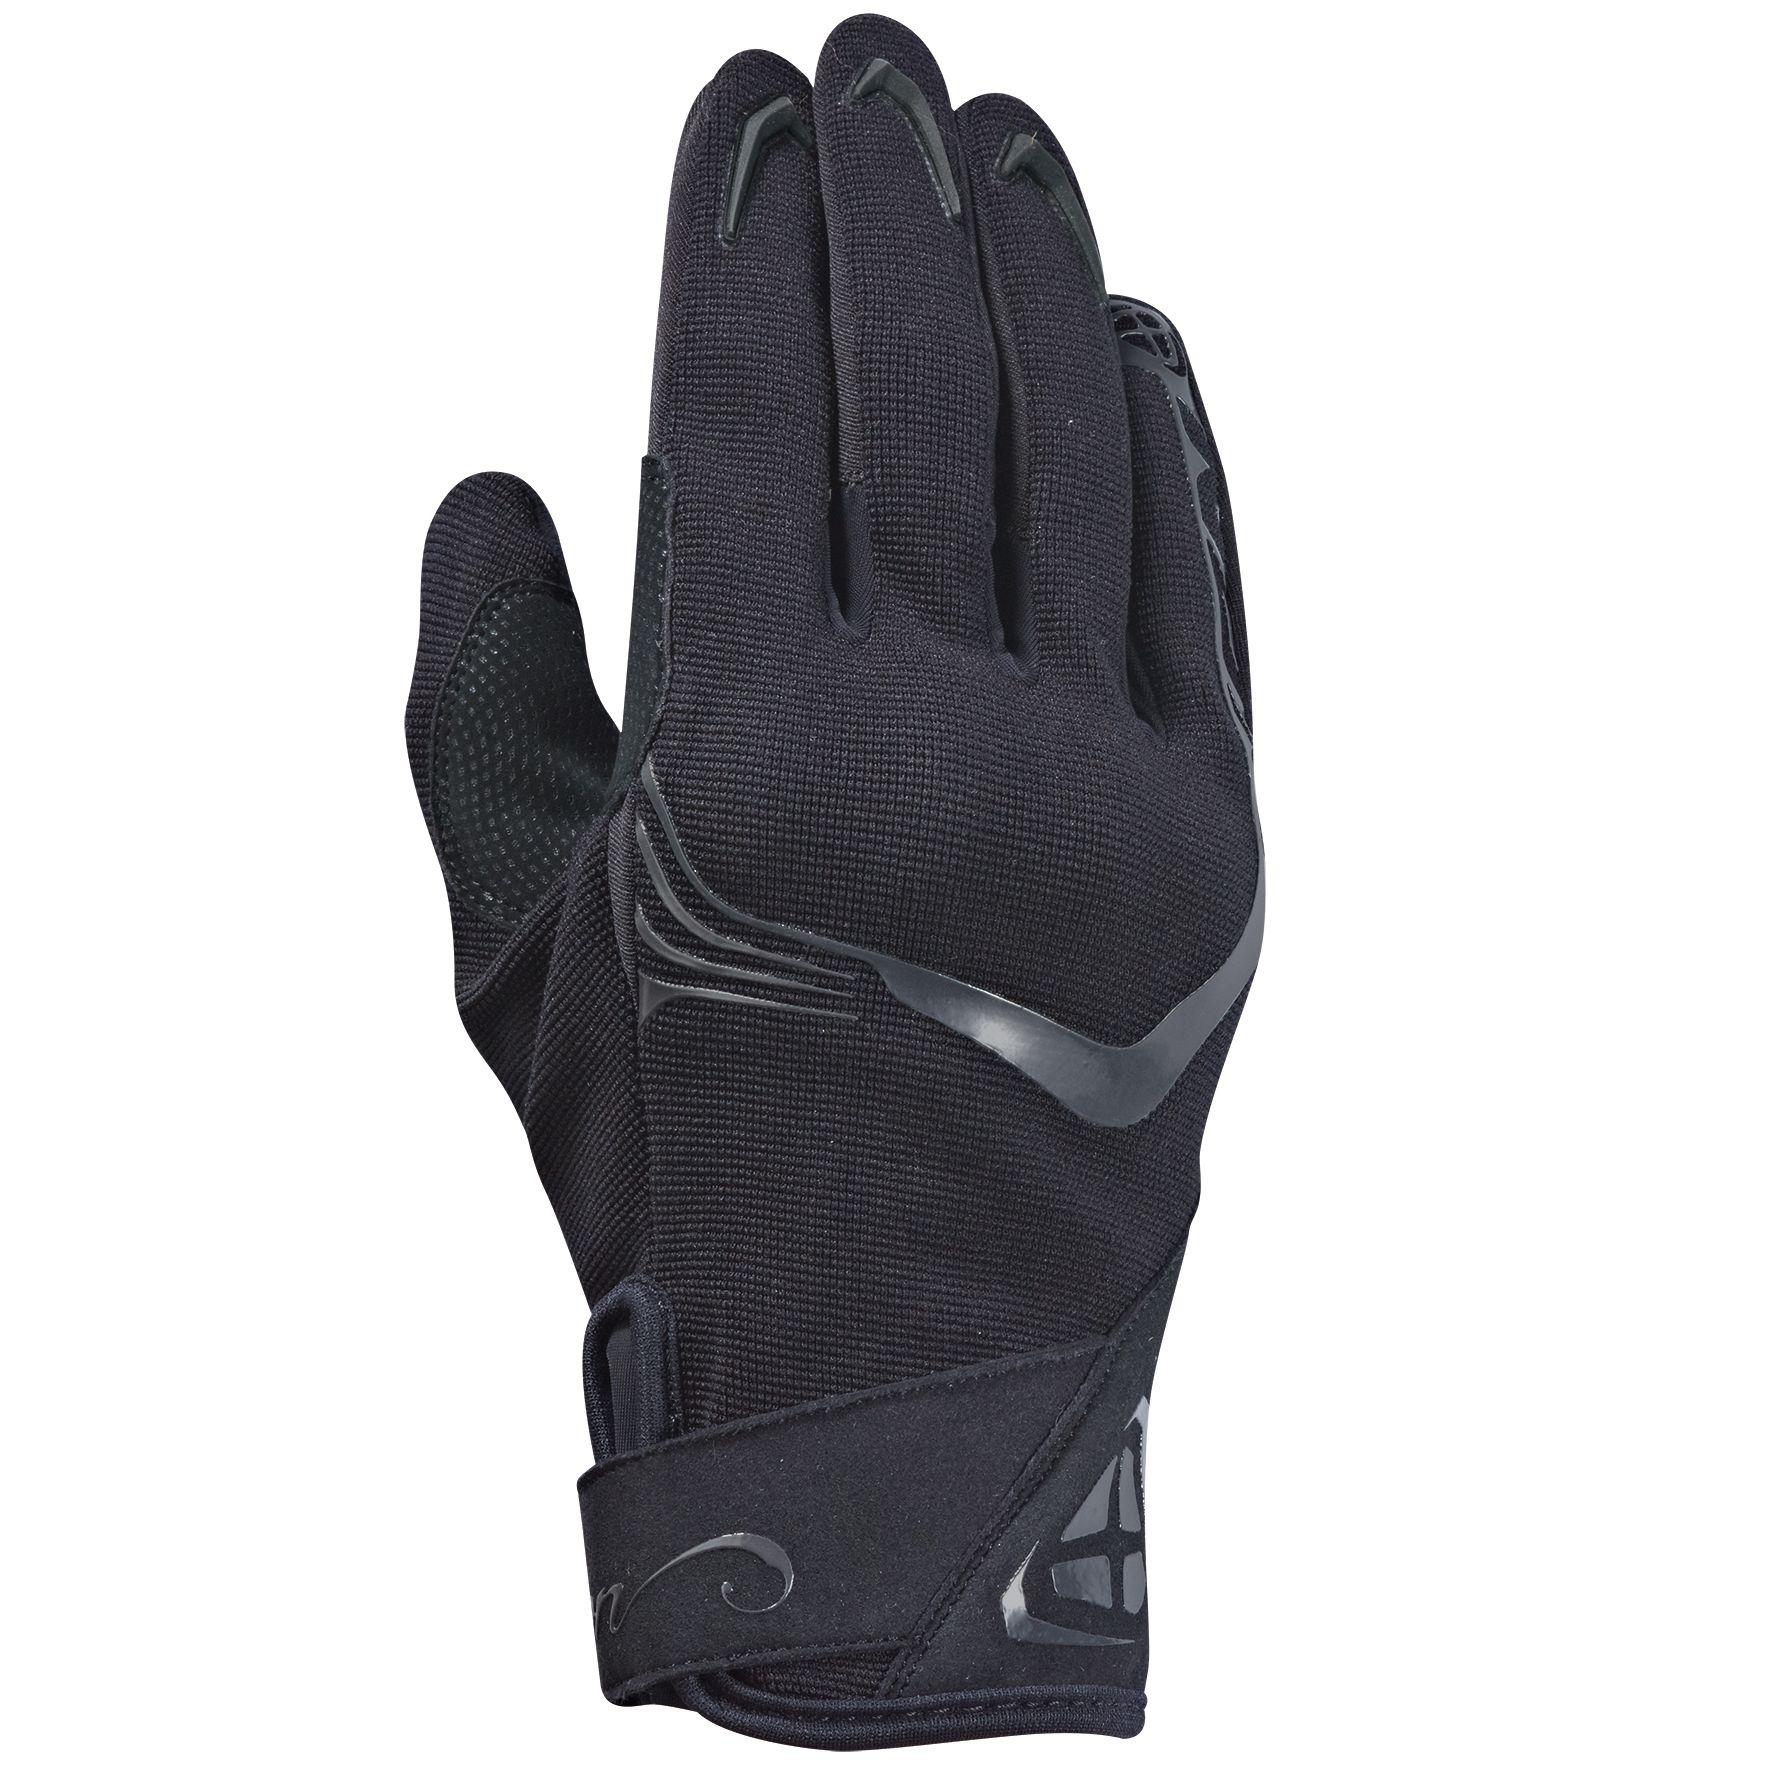 gants ixon rs lift 2 0 lady gants moto. Black Bedroom Furniture Sets. Home Design Ideas